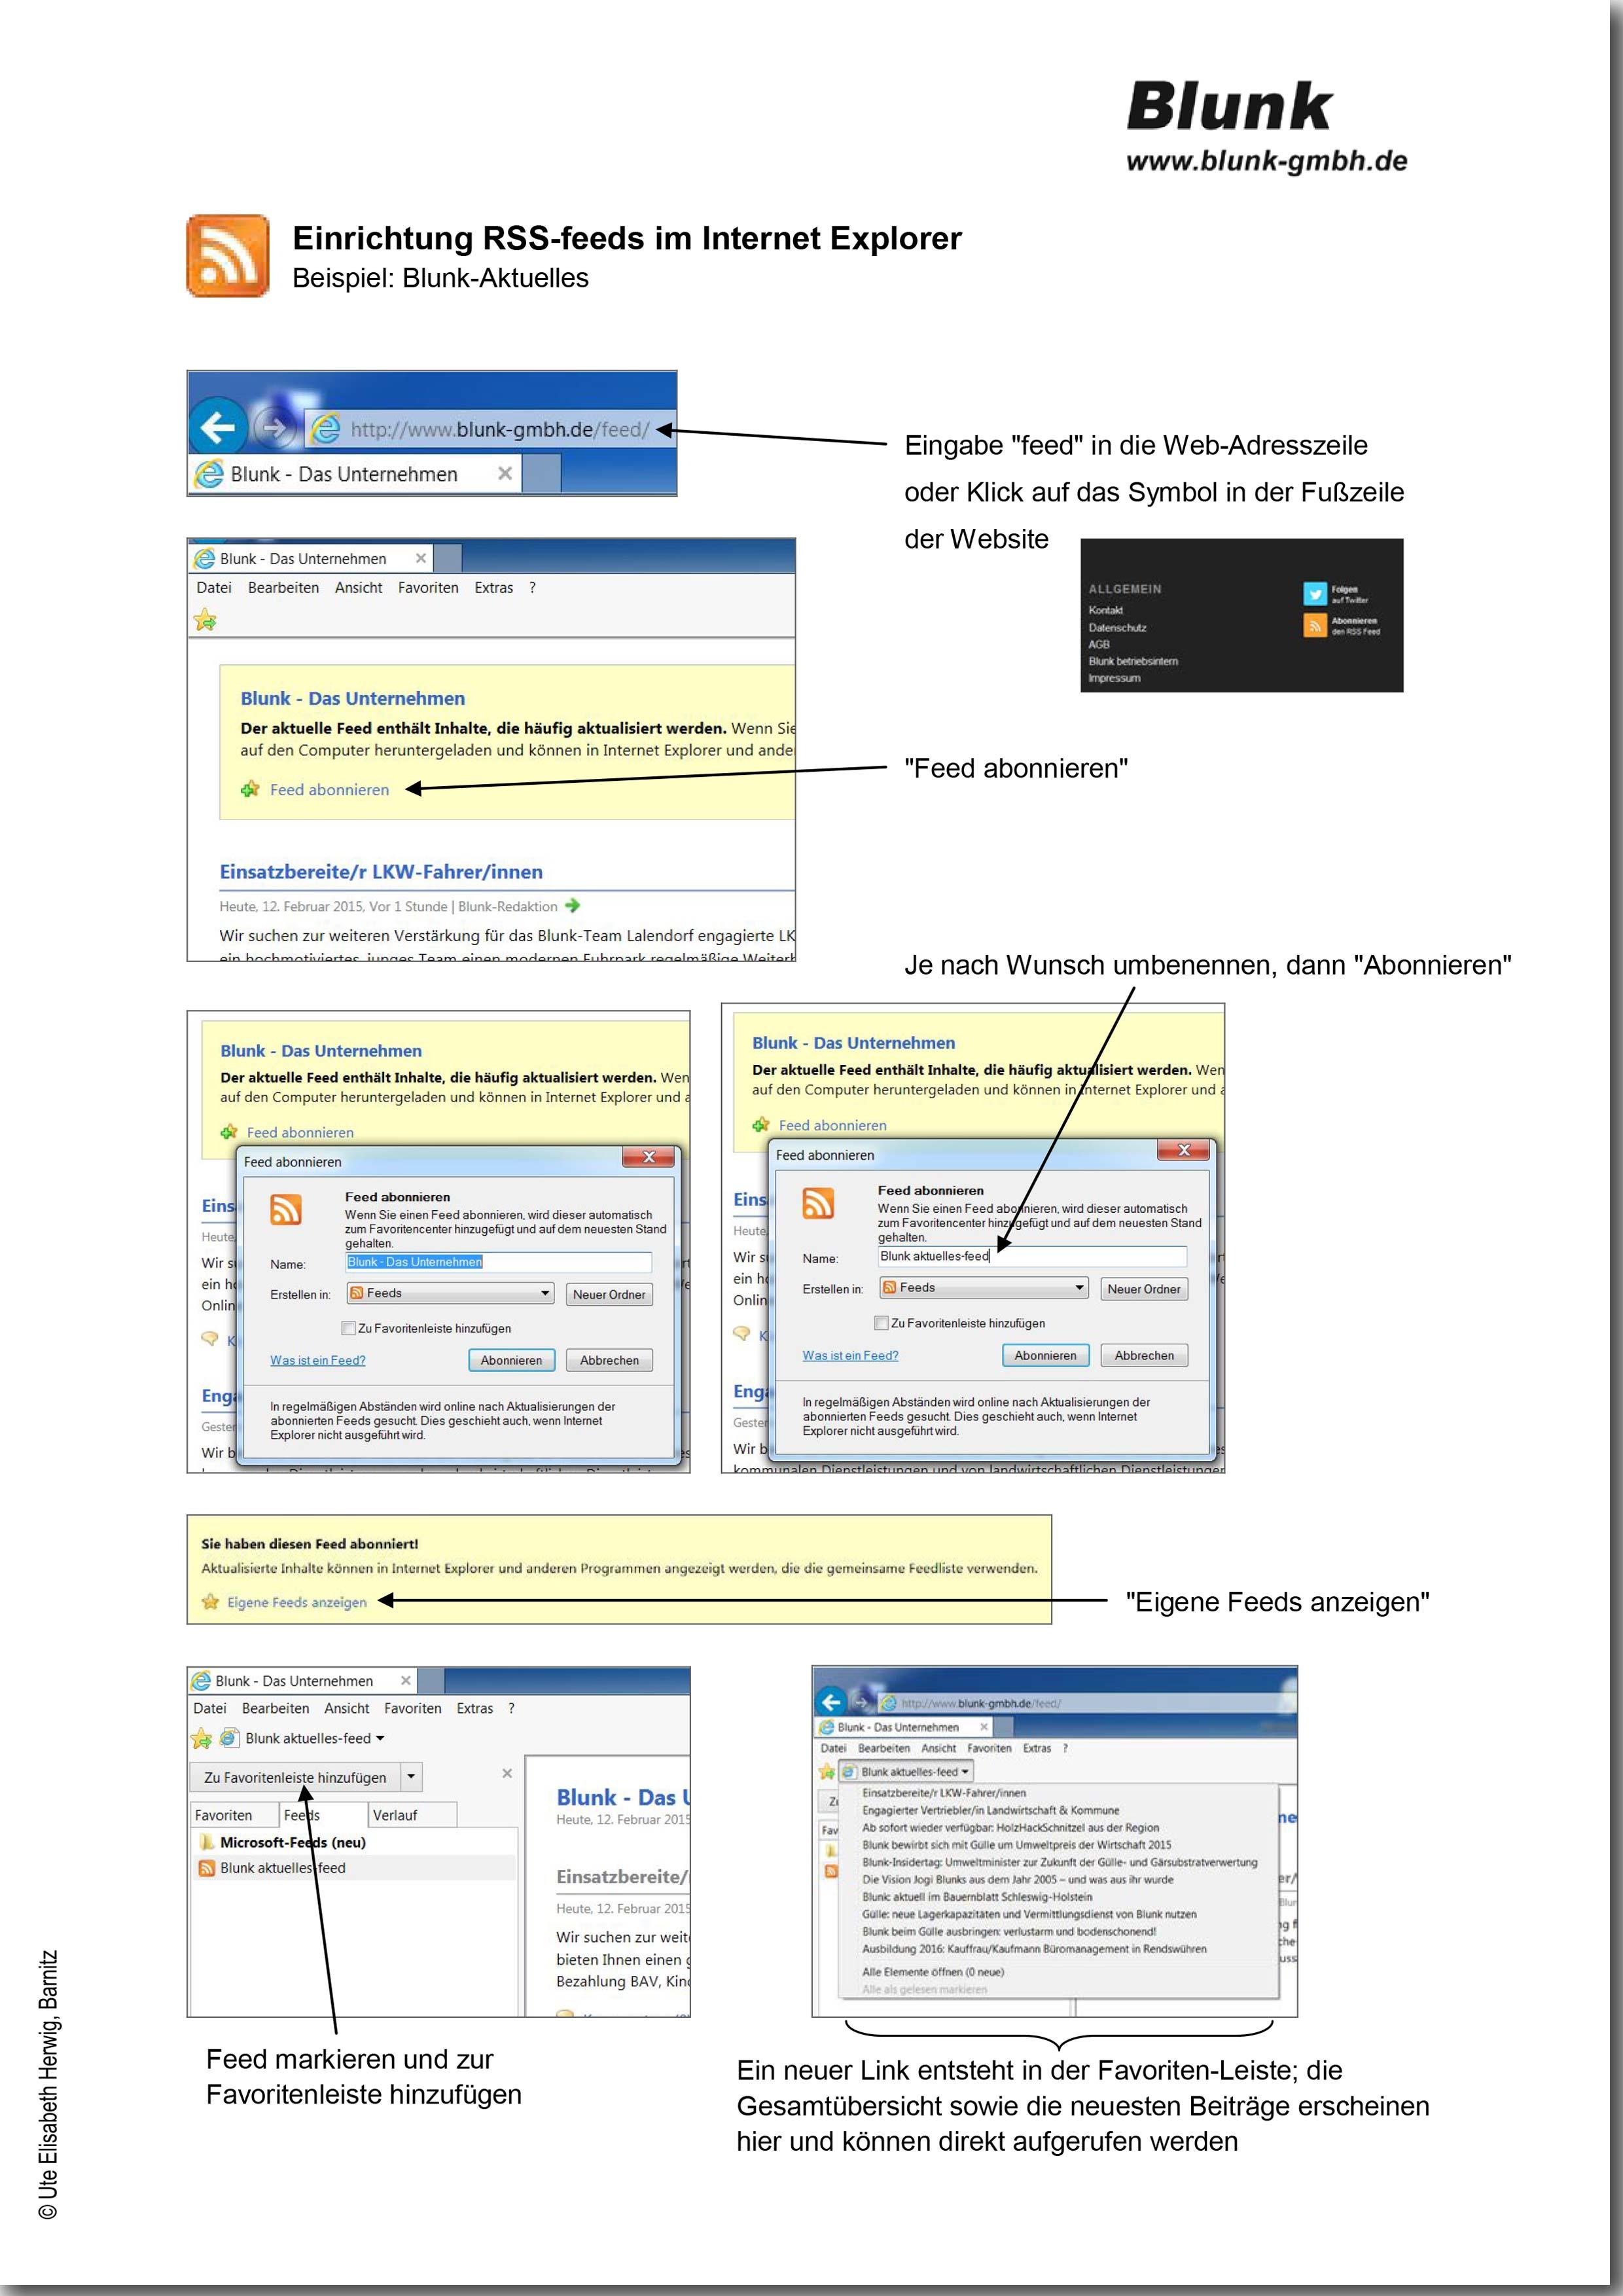 Blunk RSS feeds Internet Explorer -titel